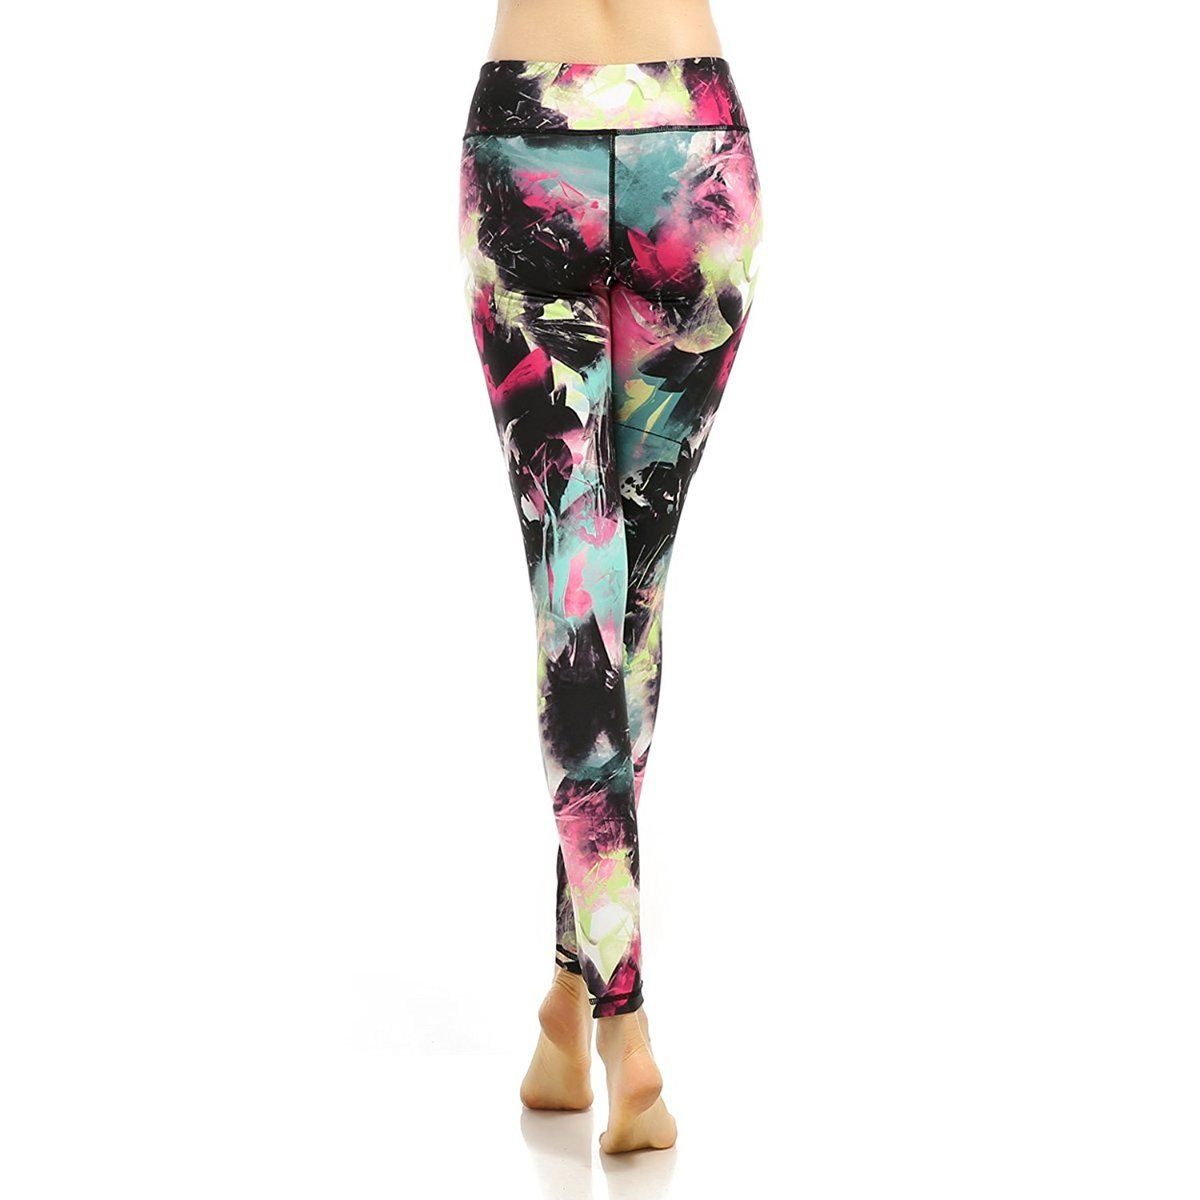 34e0371806 X-Fit Sports Yoga Fitness Leggings Spandex Running Gym Women's Capri Yoga  Pants Nylon Hidden Pocket